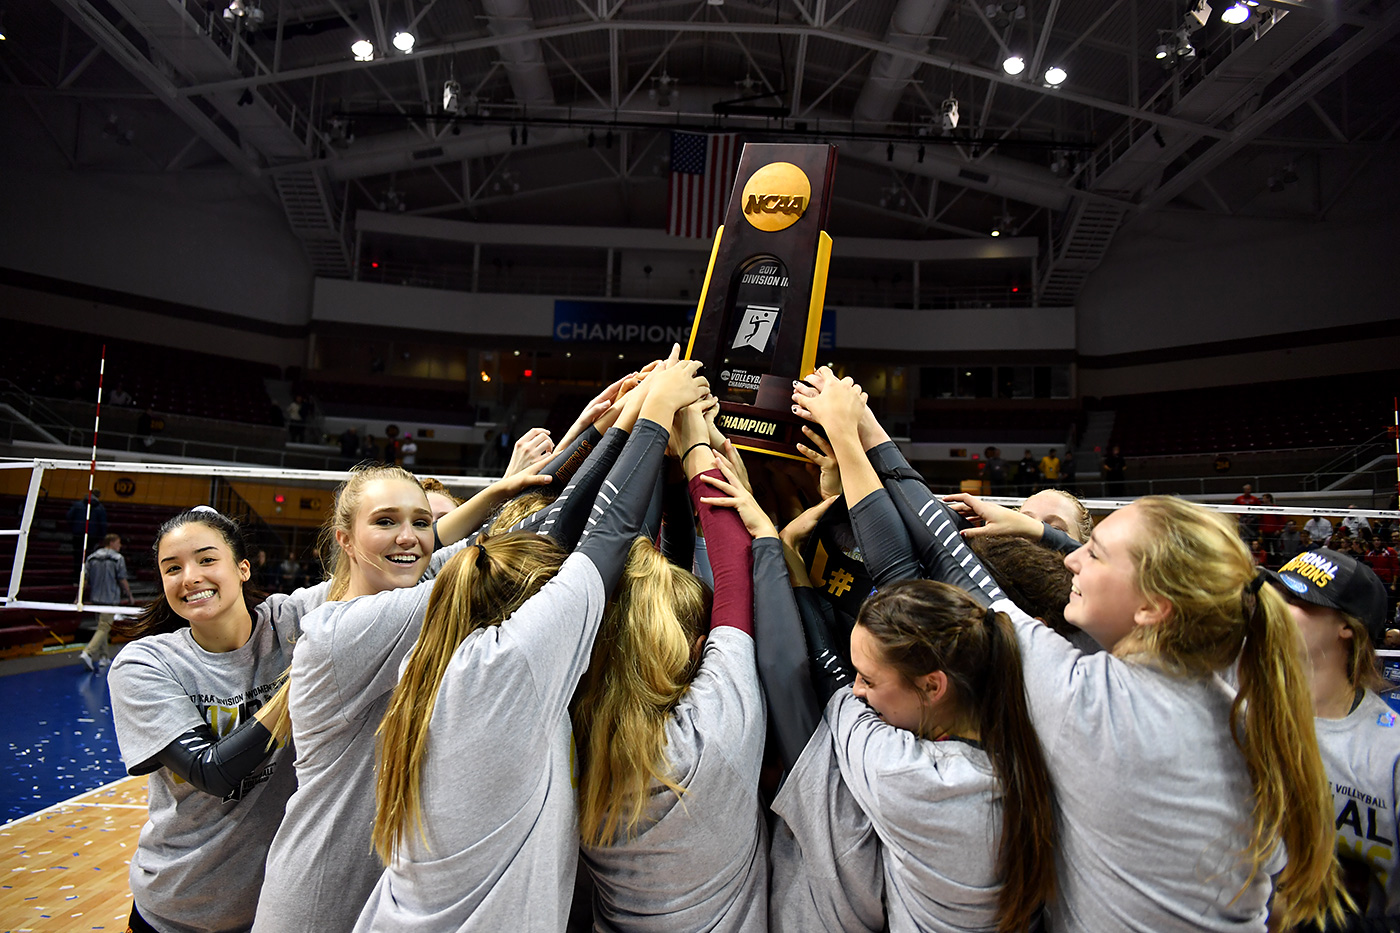 Athenas raise championship trophy